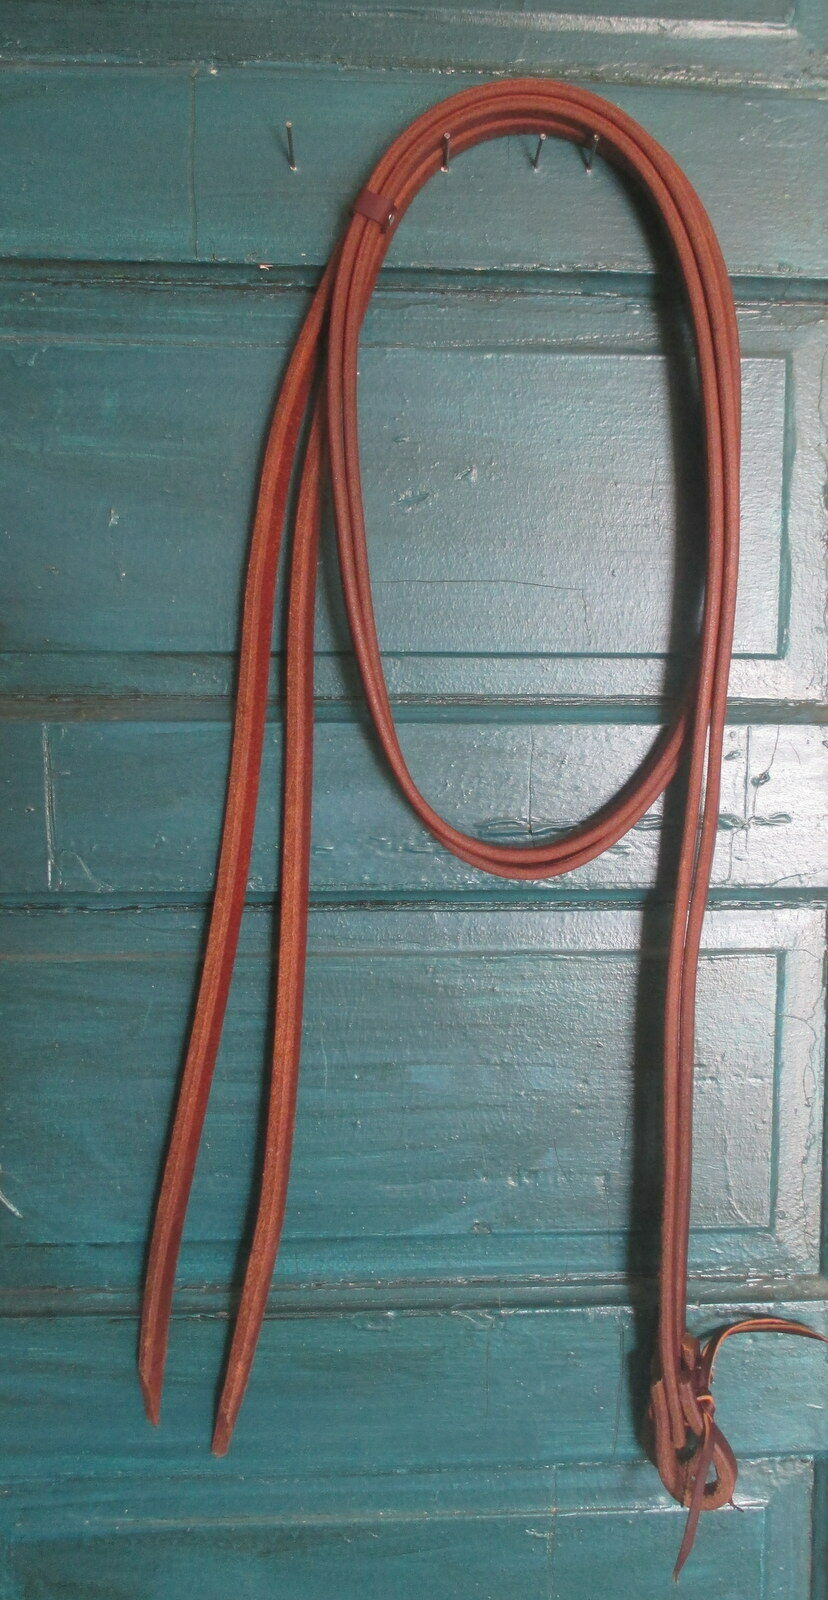 Genuine Handmade Oiled Heavy Harness Leather Split Reins 1 2 x 8